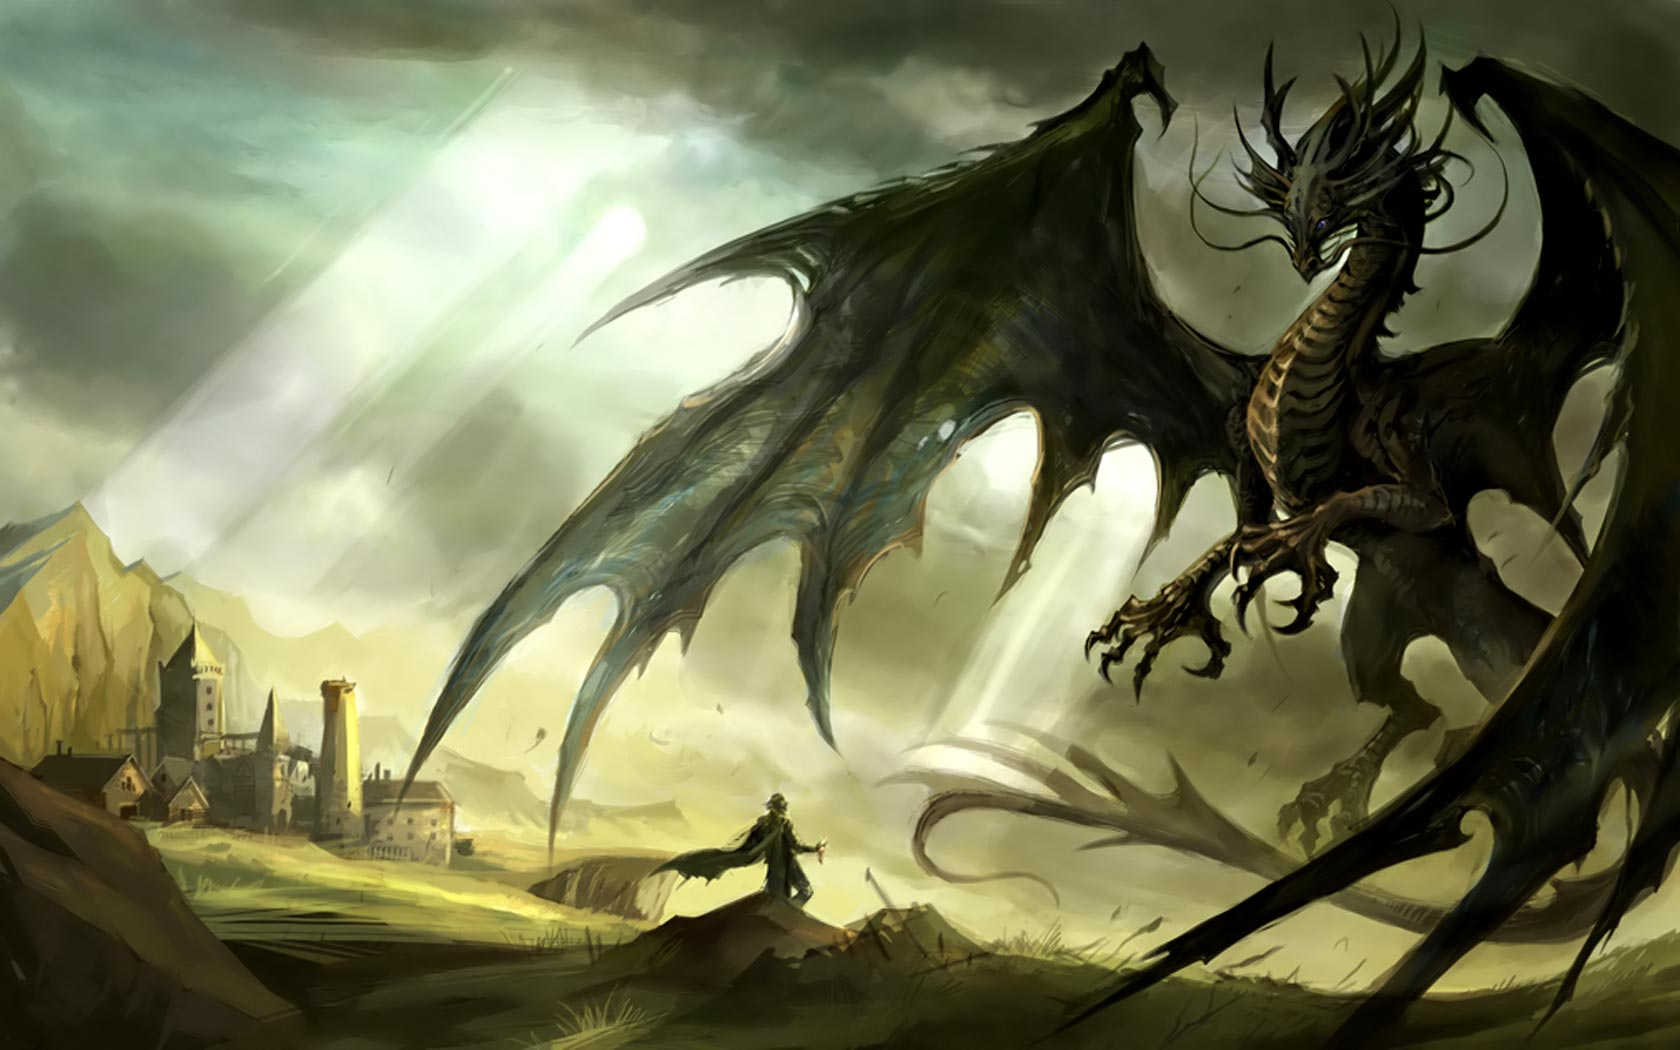 Dragon and Knight desktop backgrounds Desktop Wallpaper 1680x1050